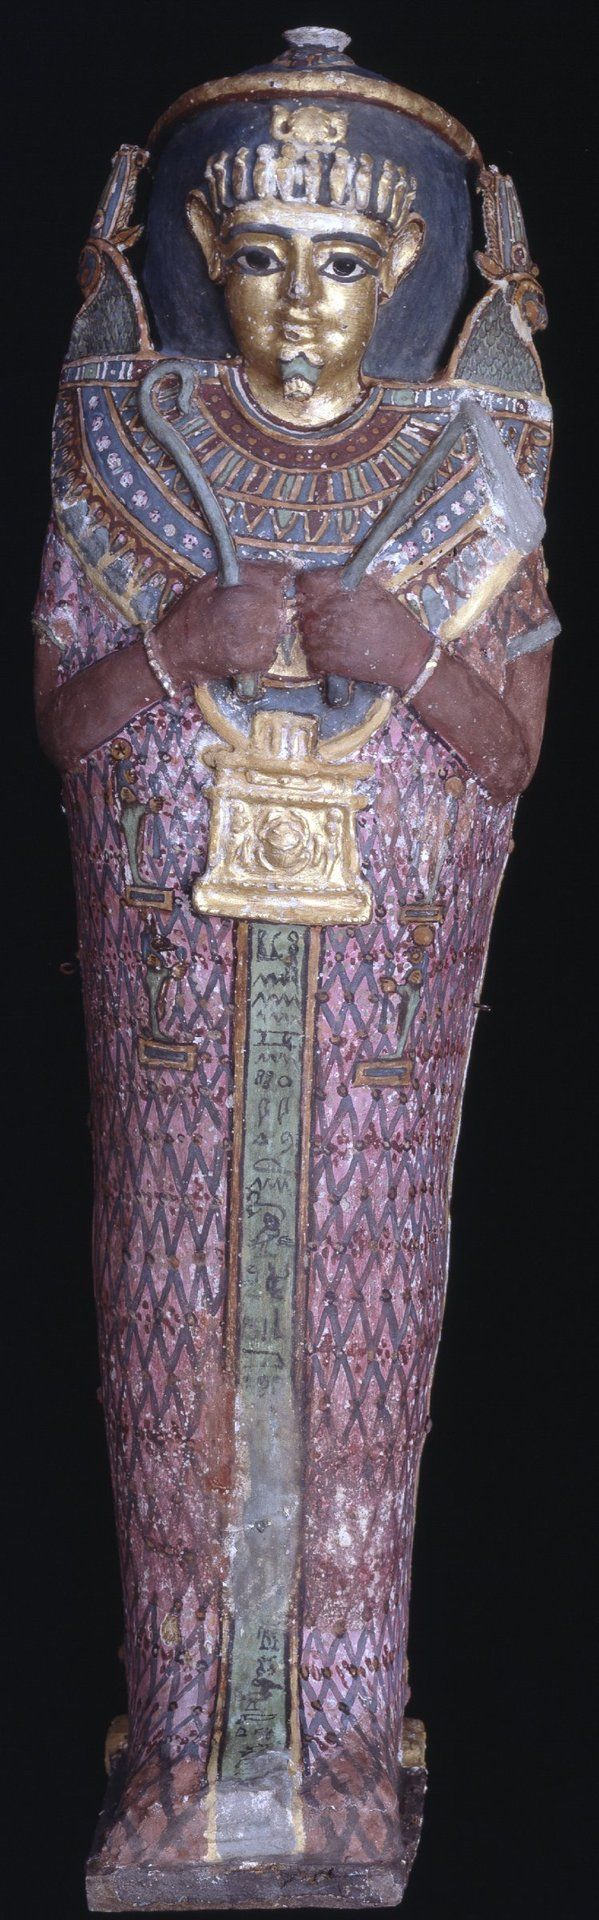 Mummy Case  Graeco-Roman 1st Century BC- 1st Century AD Found Akhmim, Egypt